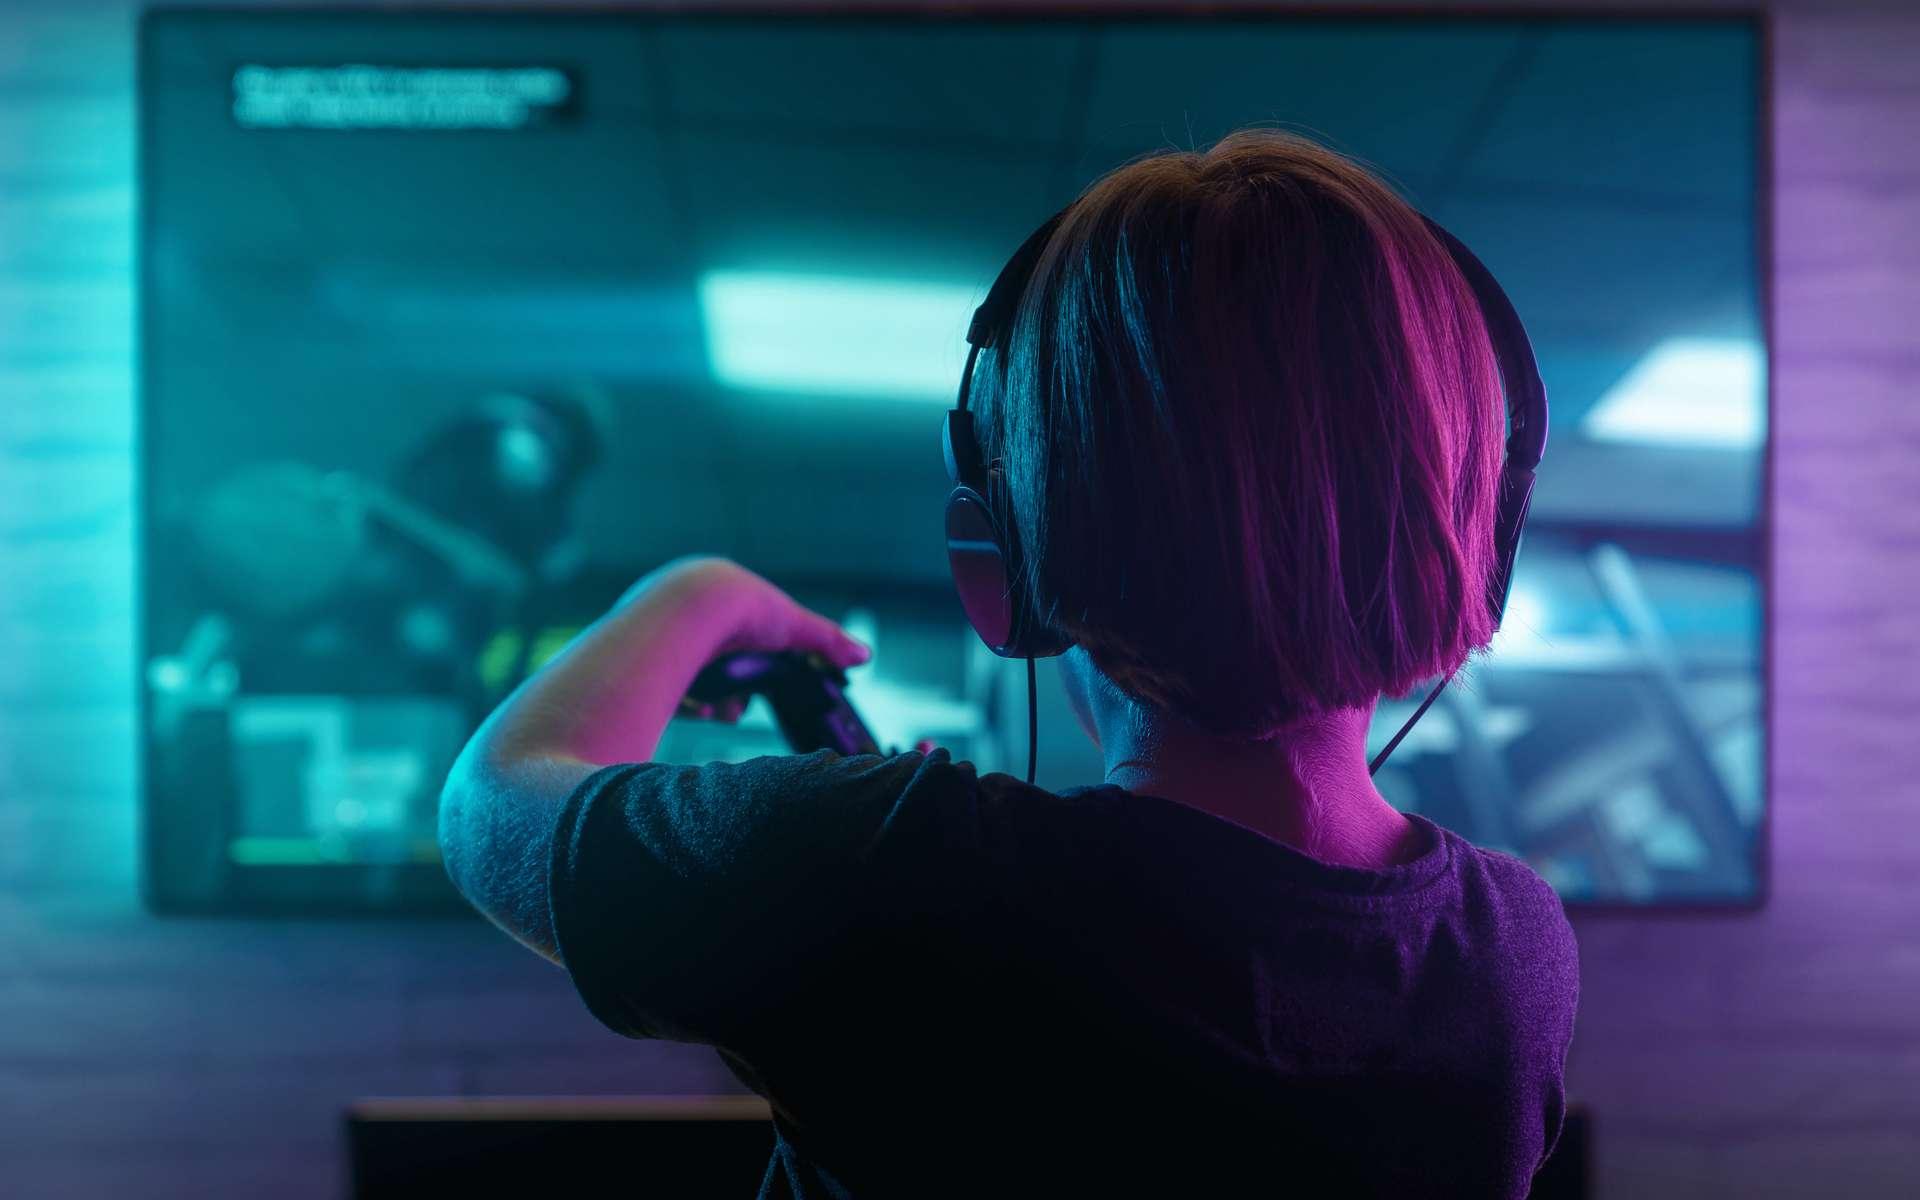 La TV gaming avec HDMI 2.1, idéale pour les gamers. © rangizzz, Adobe Stock